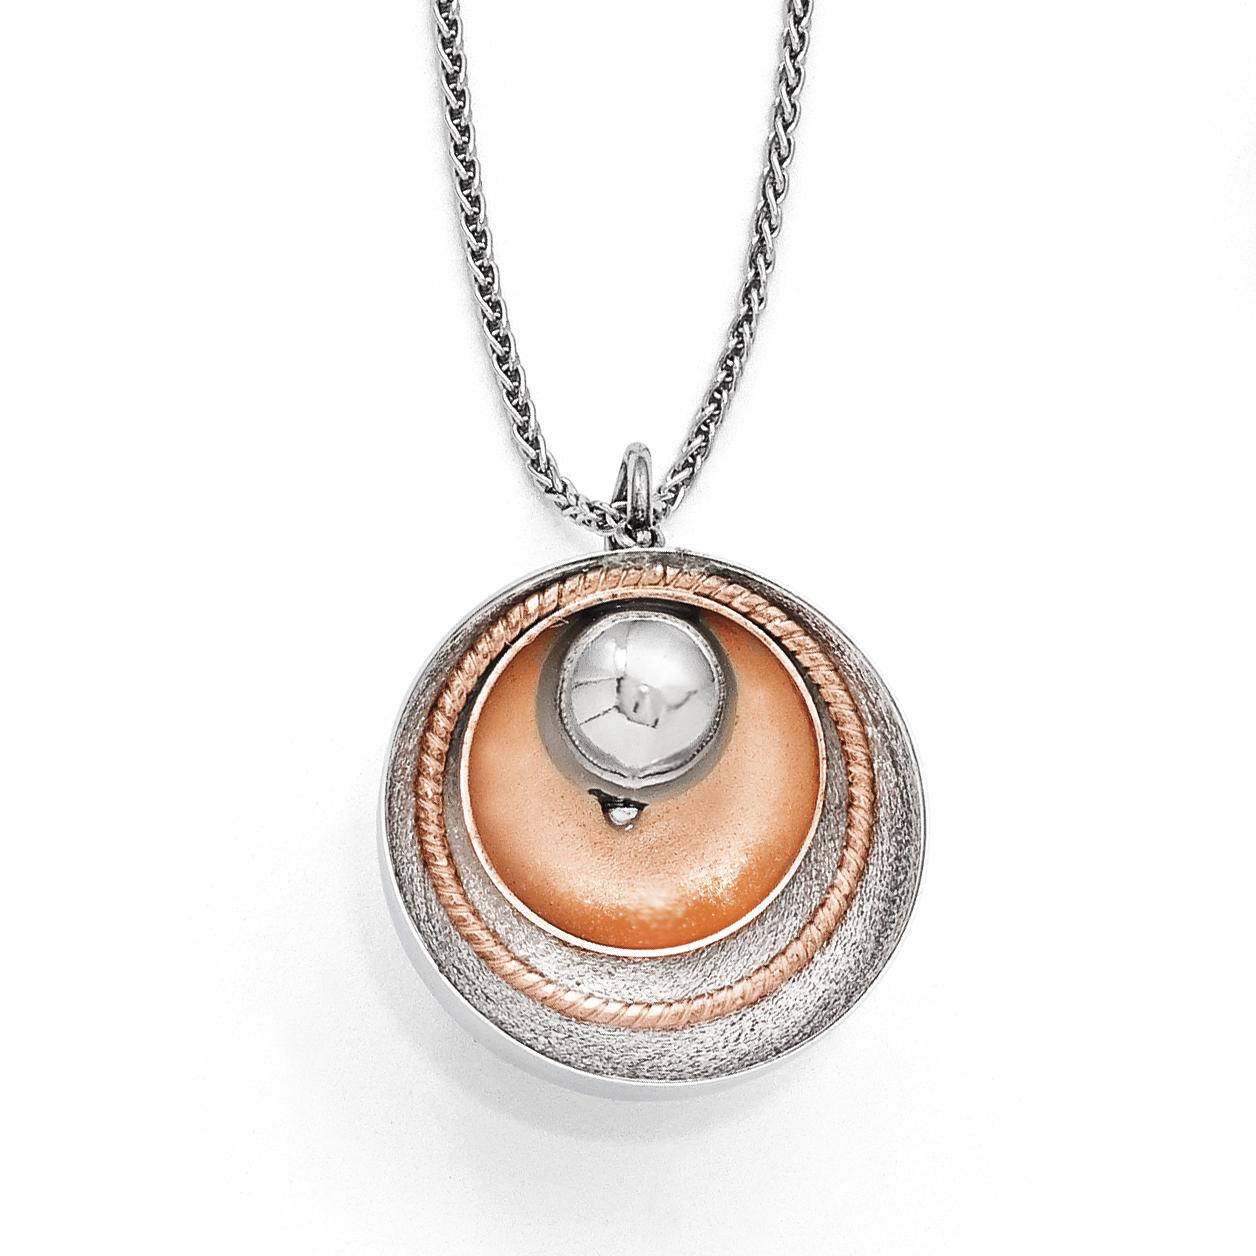 Leslie's Sterling Silver Rose Gold-plated Polished Pendant